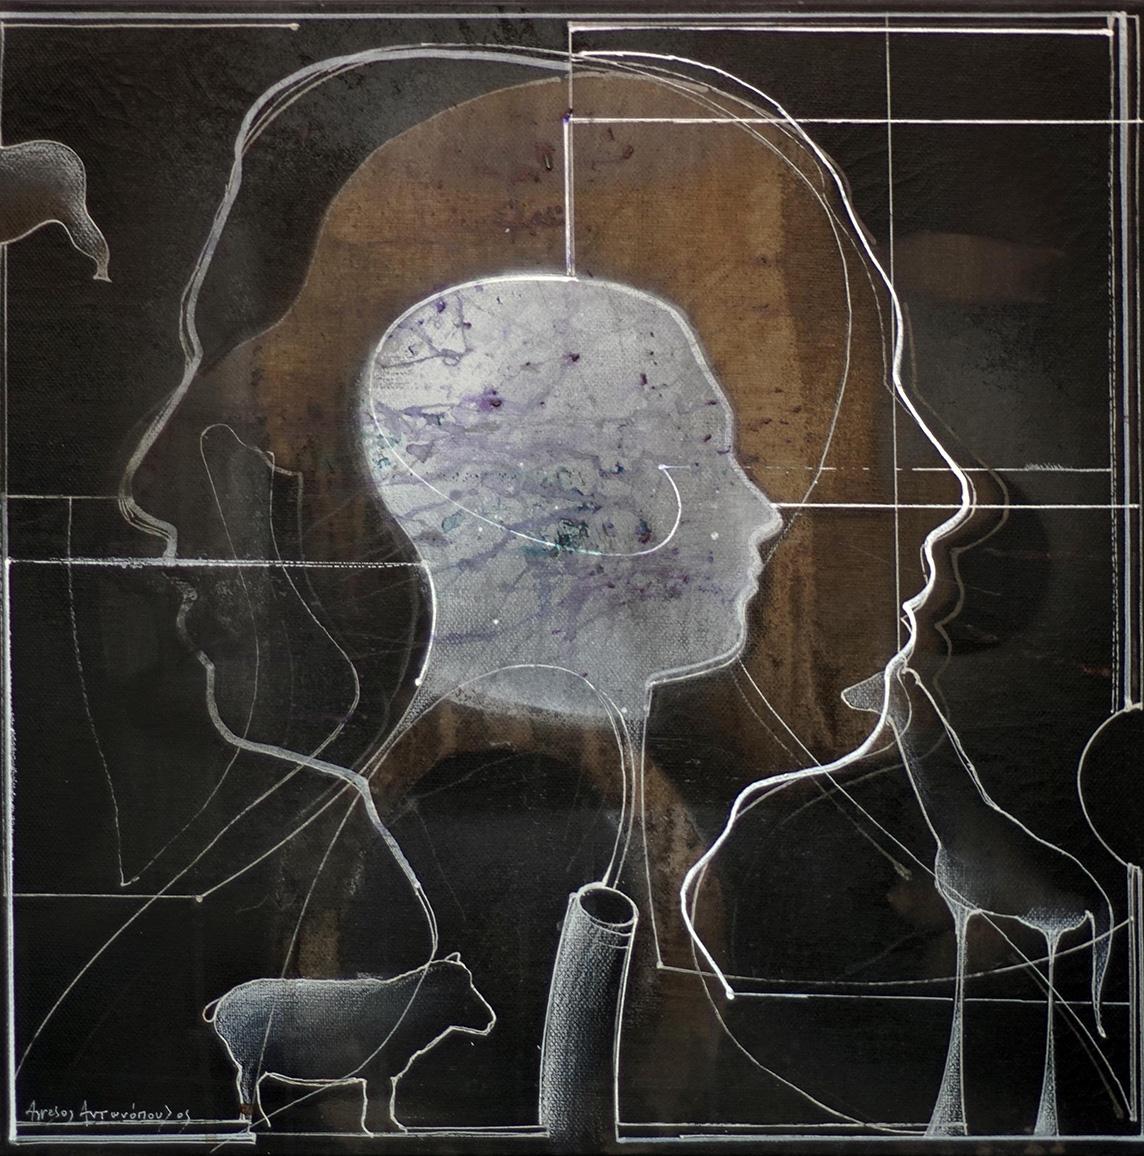 Aggelos Antonopoulos, Portrait II, 2019, acrylics on canvas, 40 x 40 cm